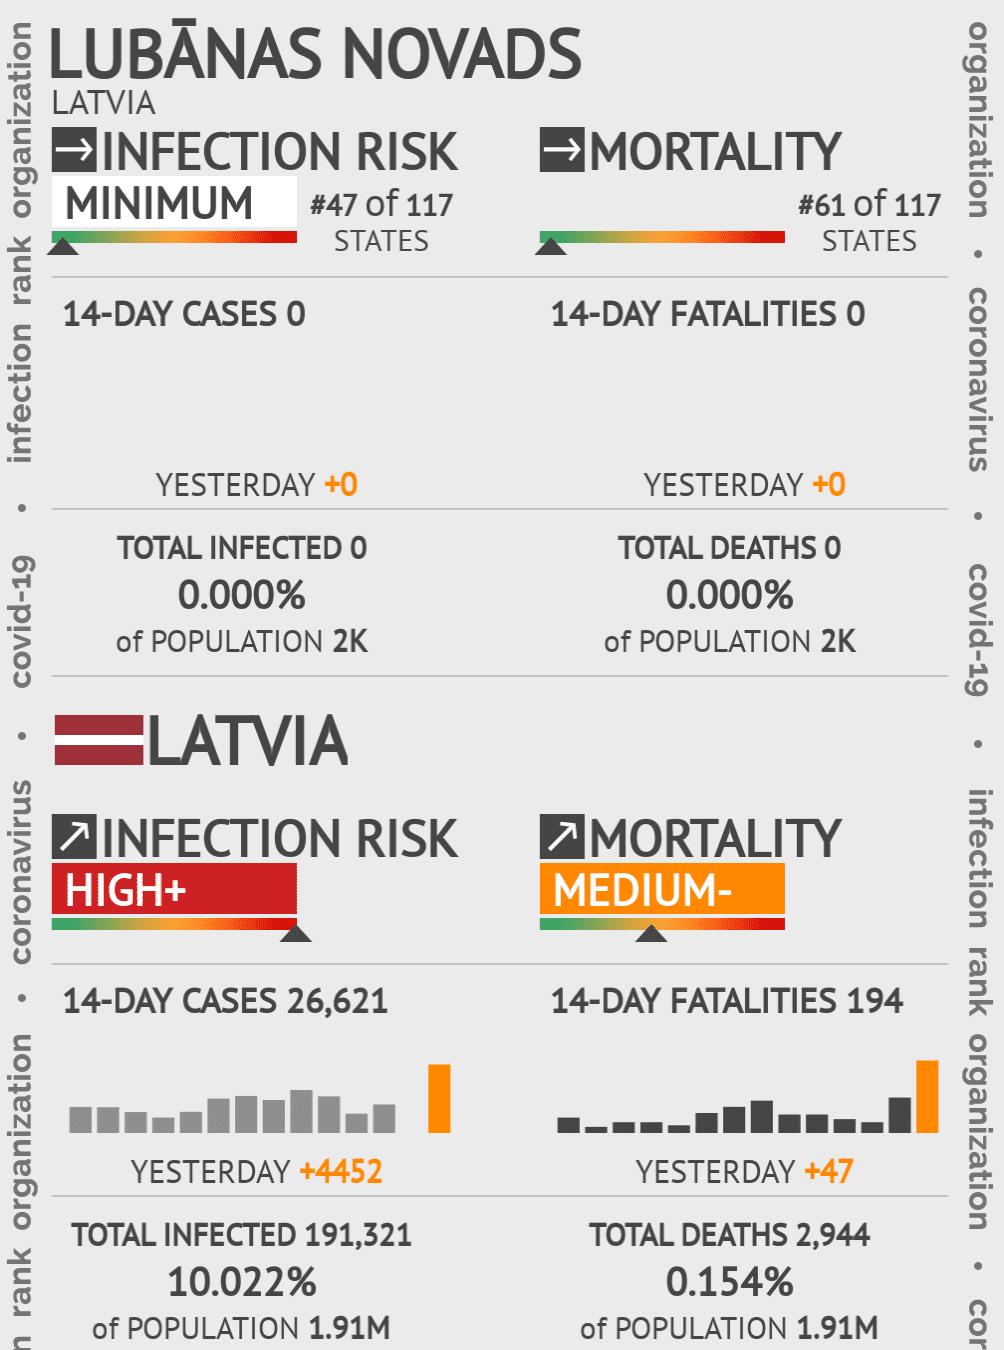 Lubānas novads Coronavirus Covid-19 Risk of Infection on May 06, 2020